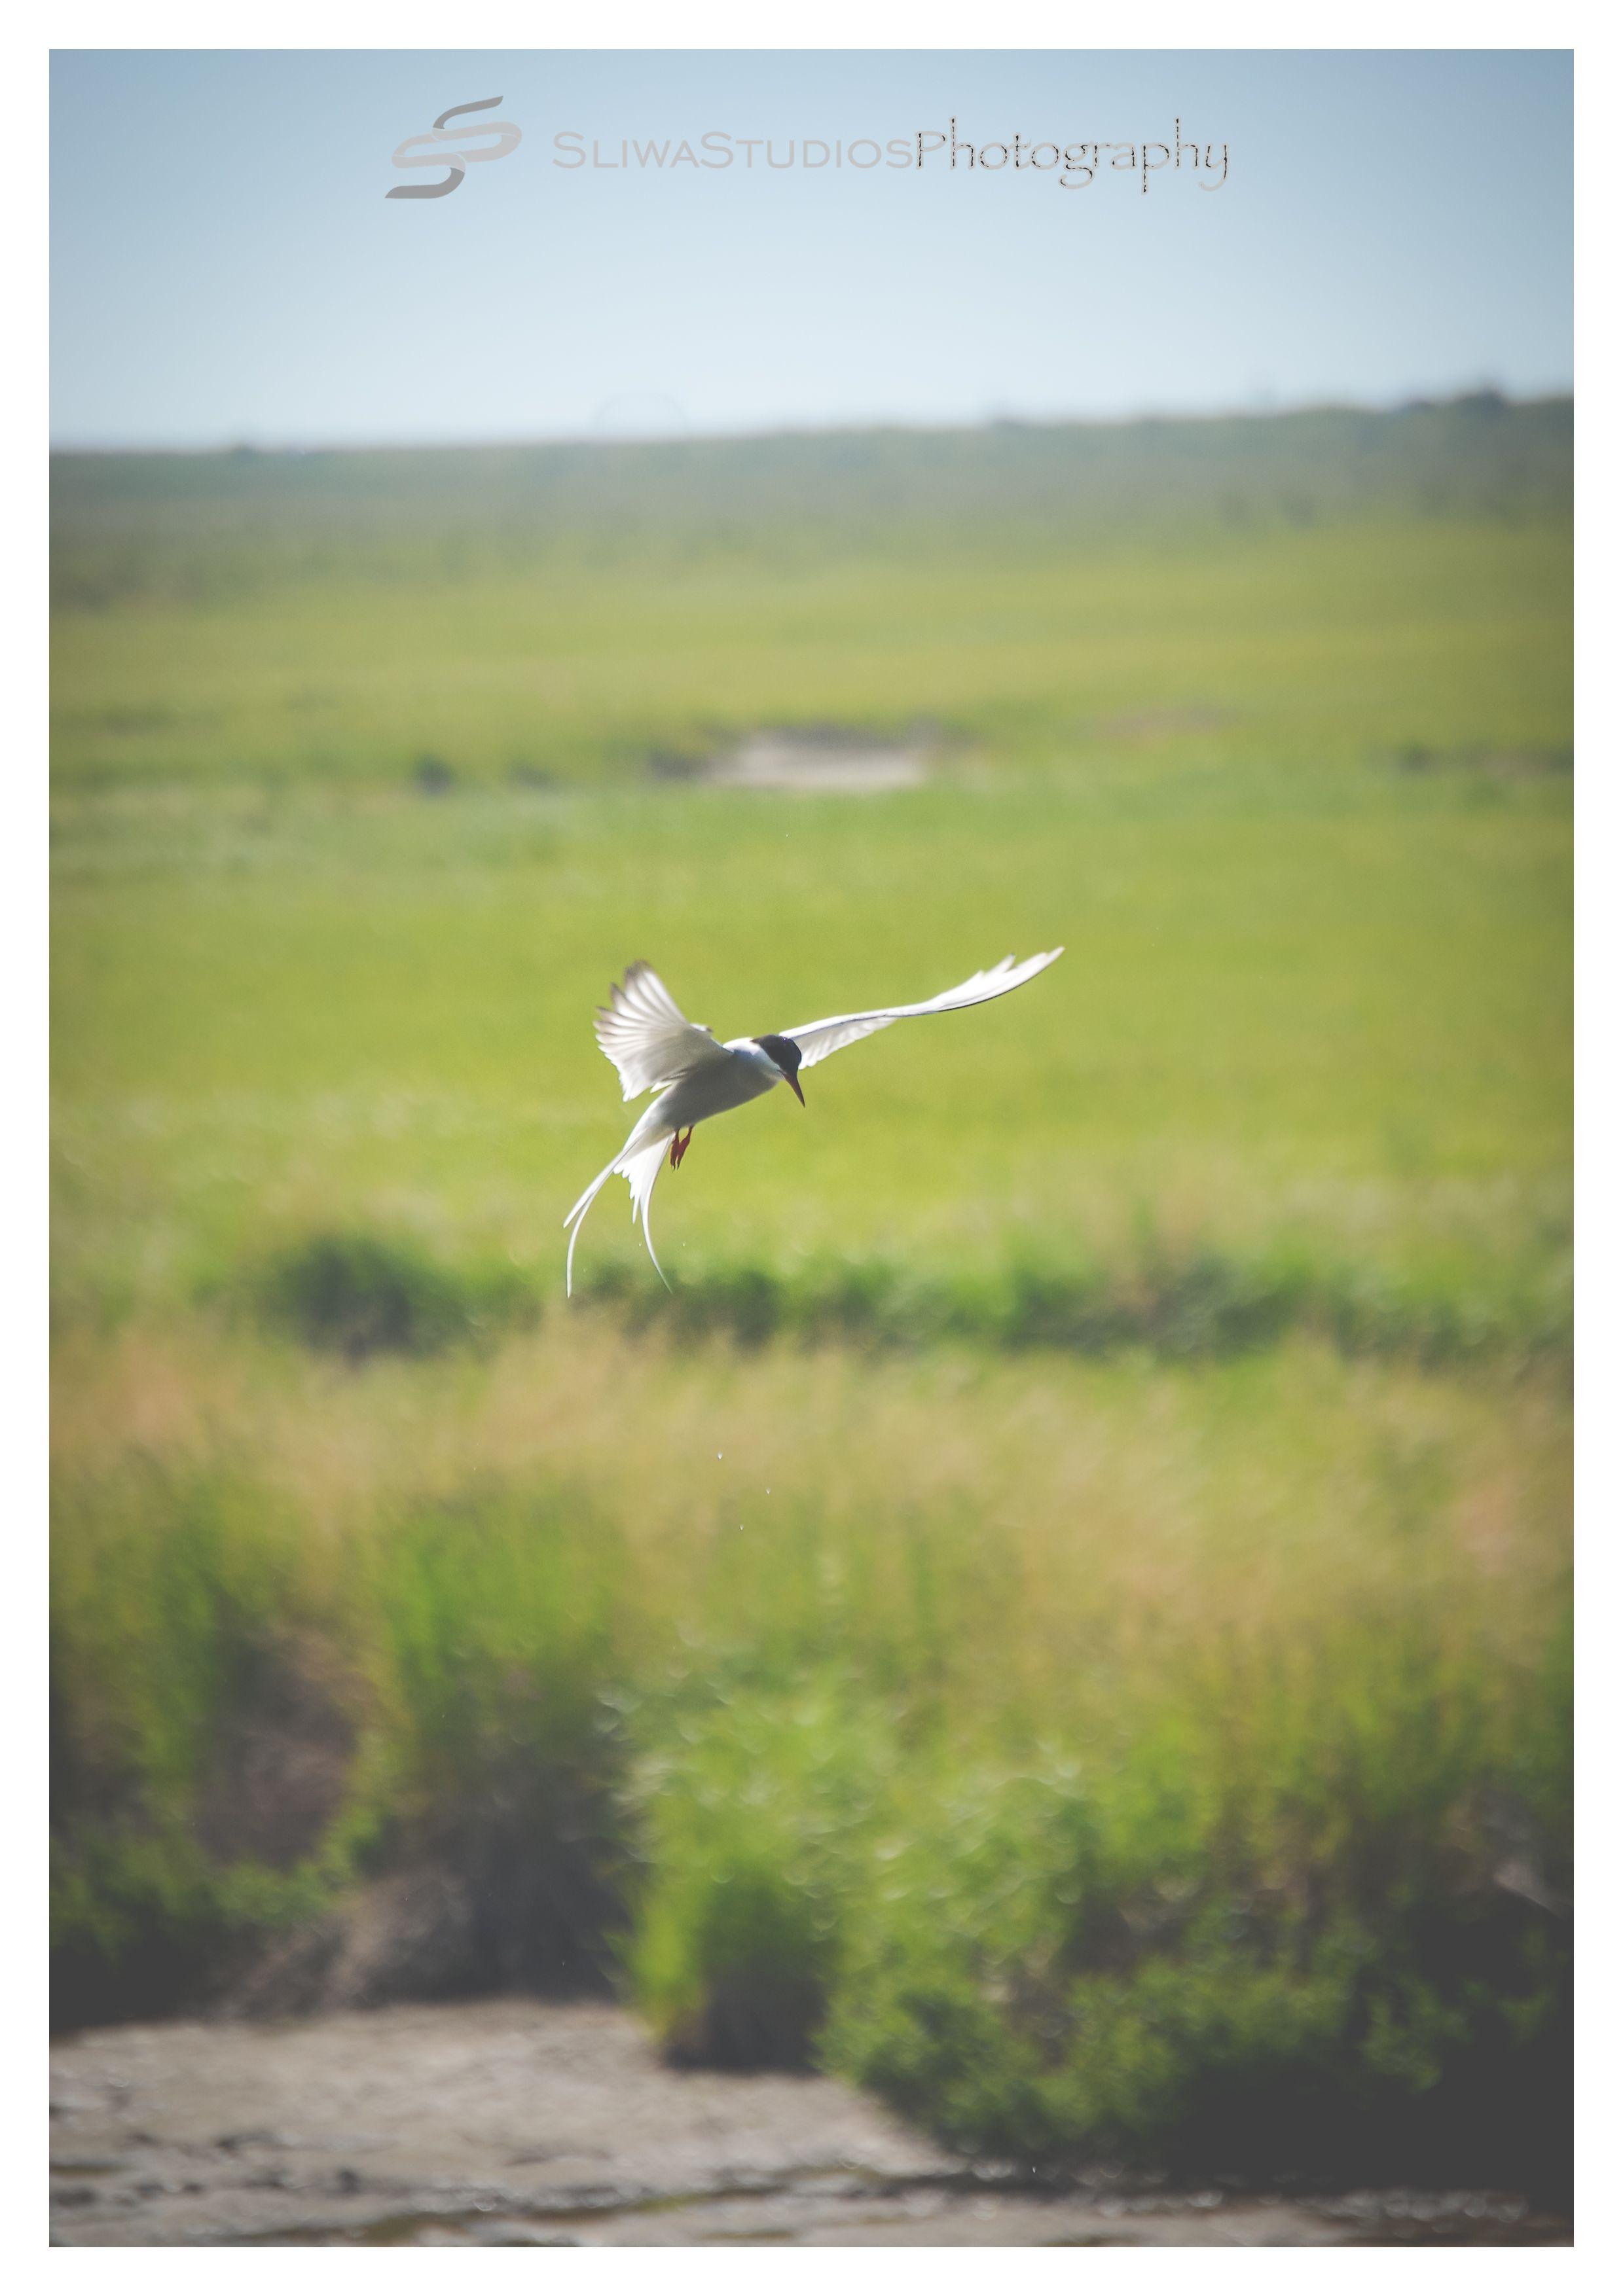 Alaska| Plains Bird 2015| Orlando Photographer| Landscape Photography| Sliwa Studios Photography